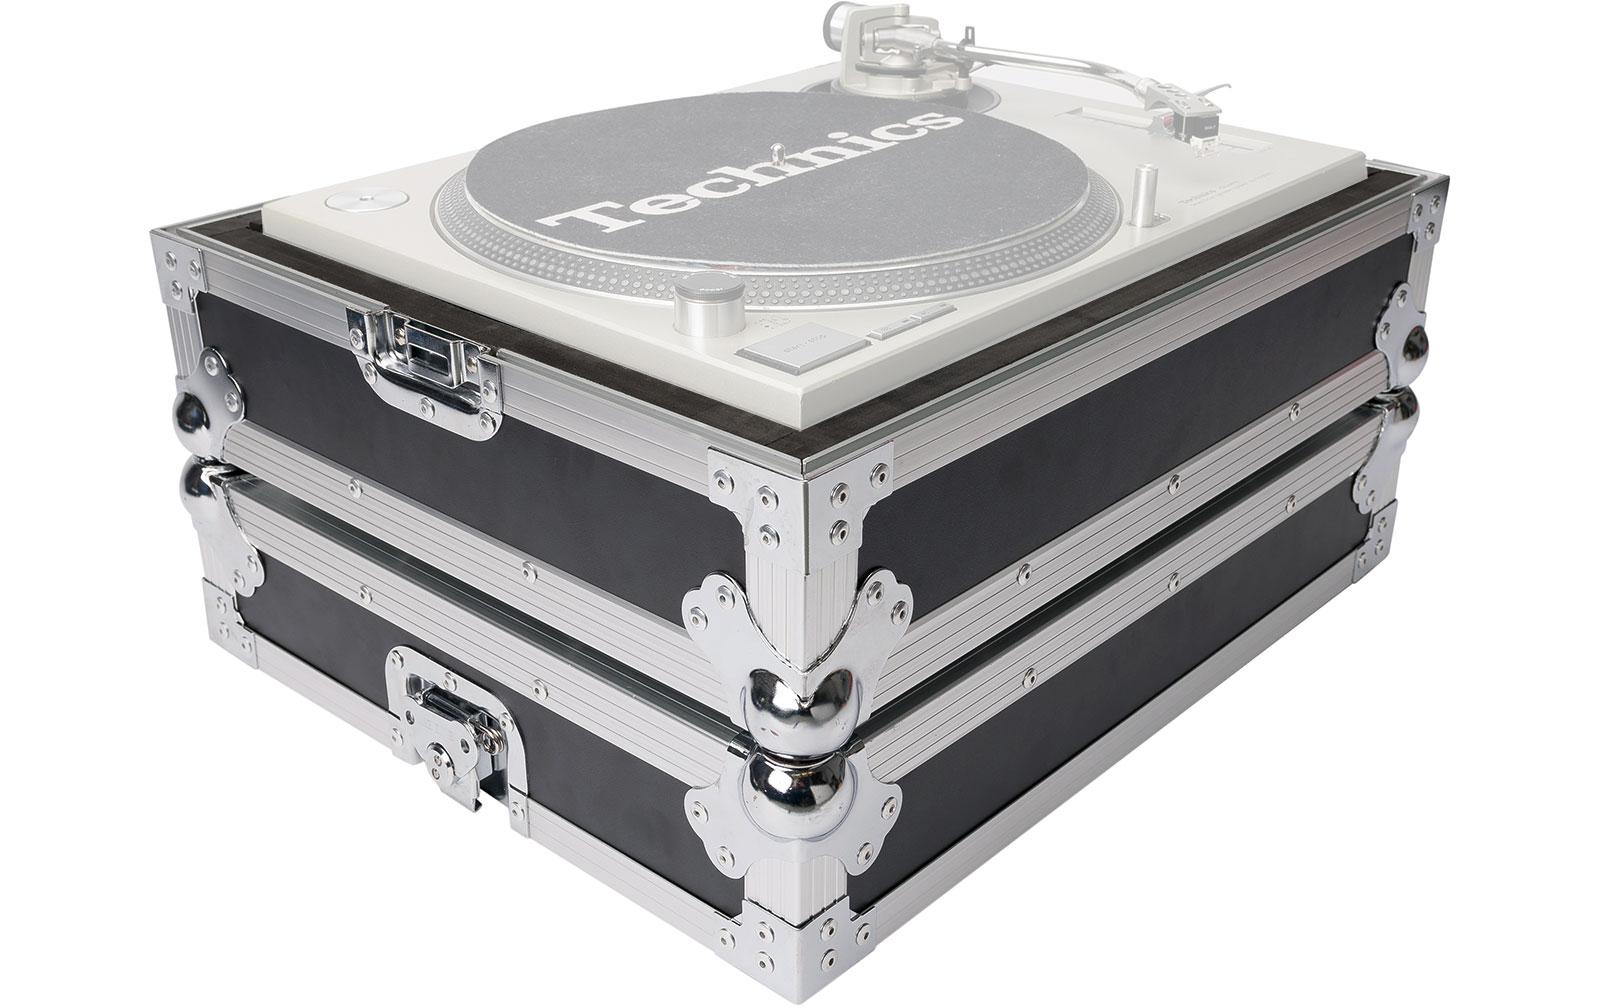 magma-multi-format-turntable-case-black-silver